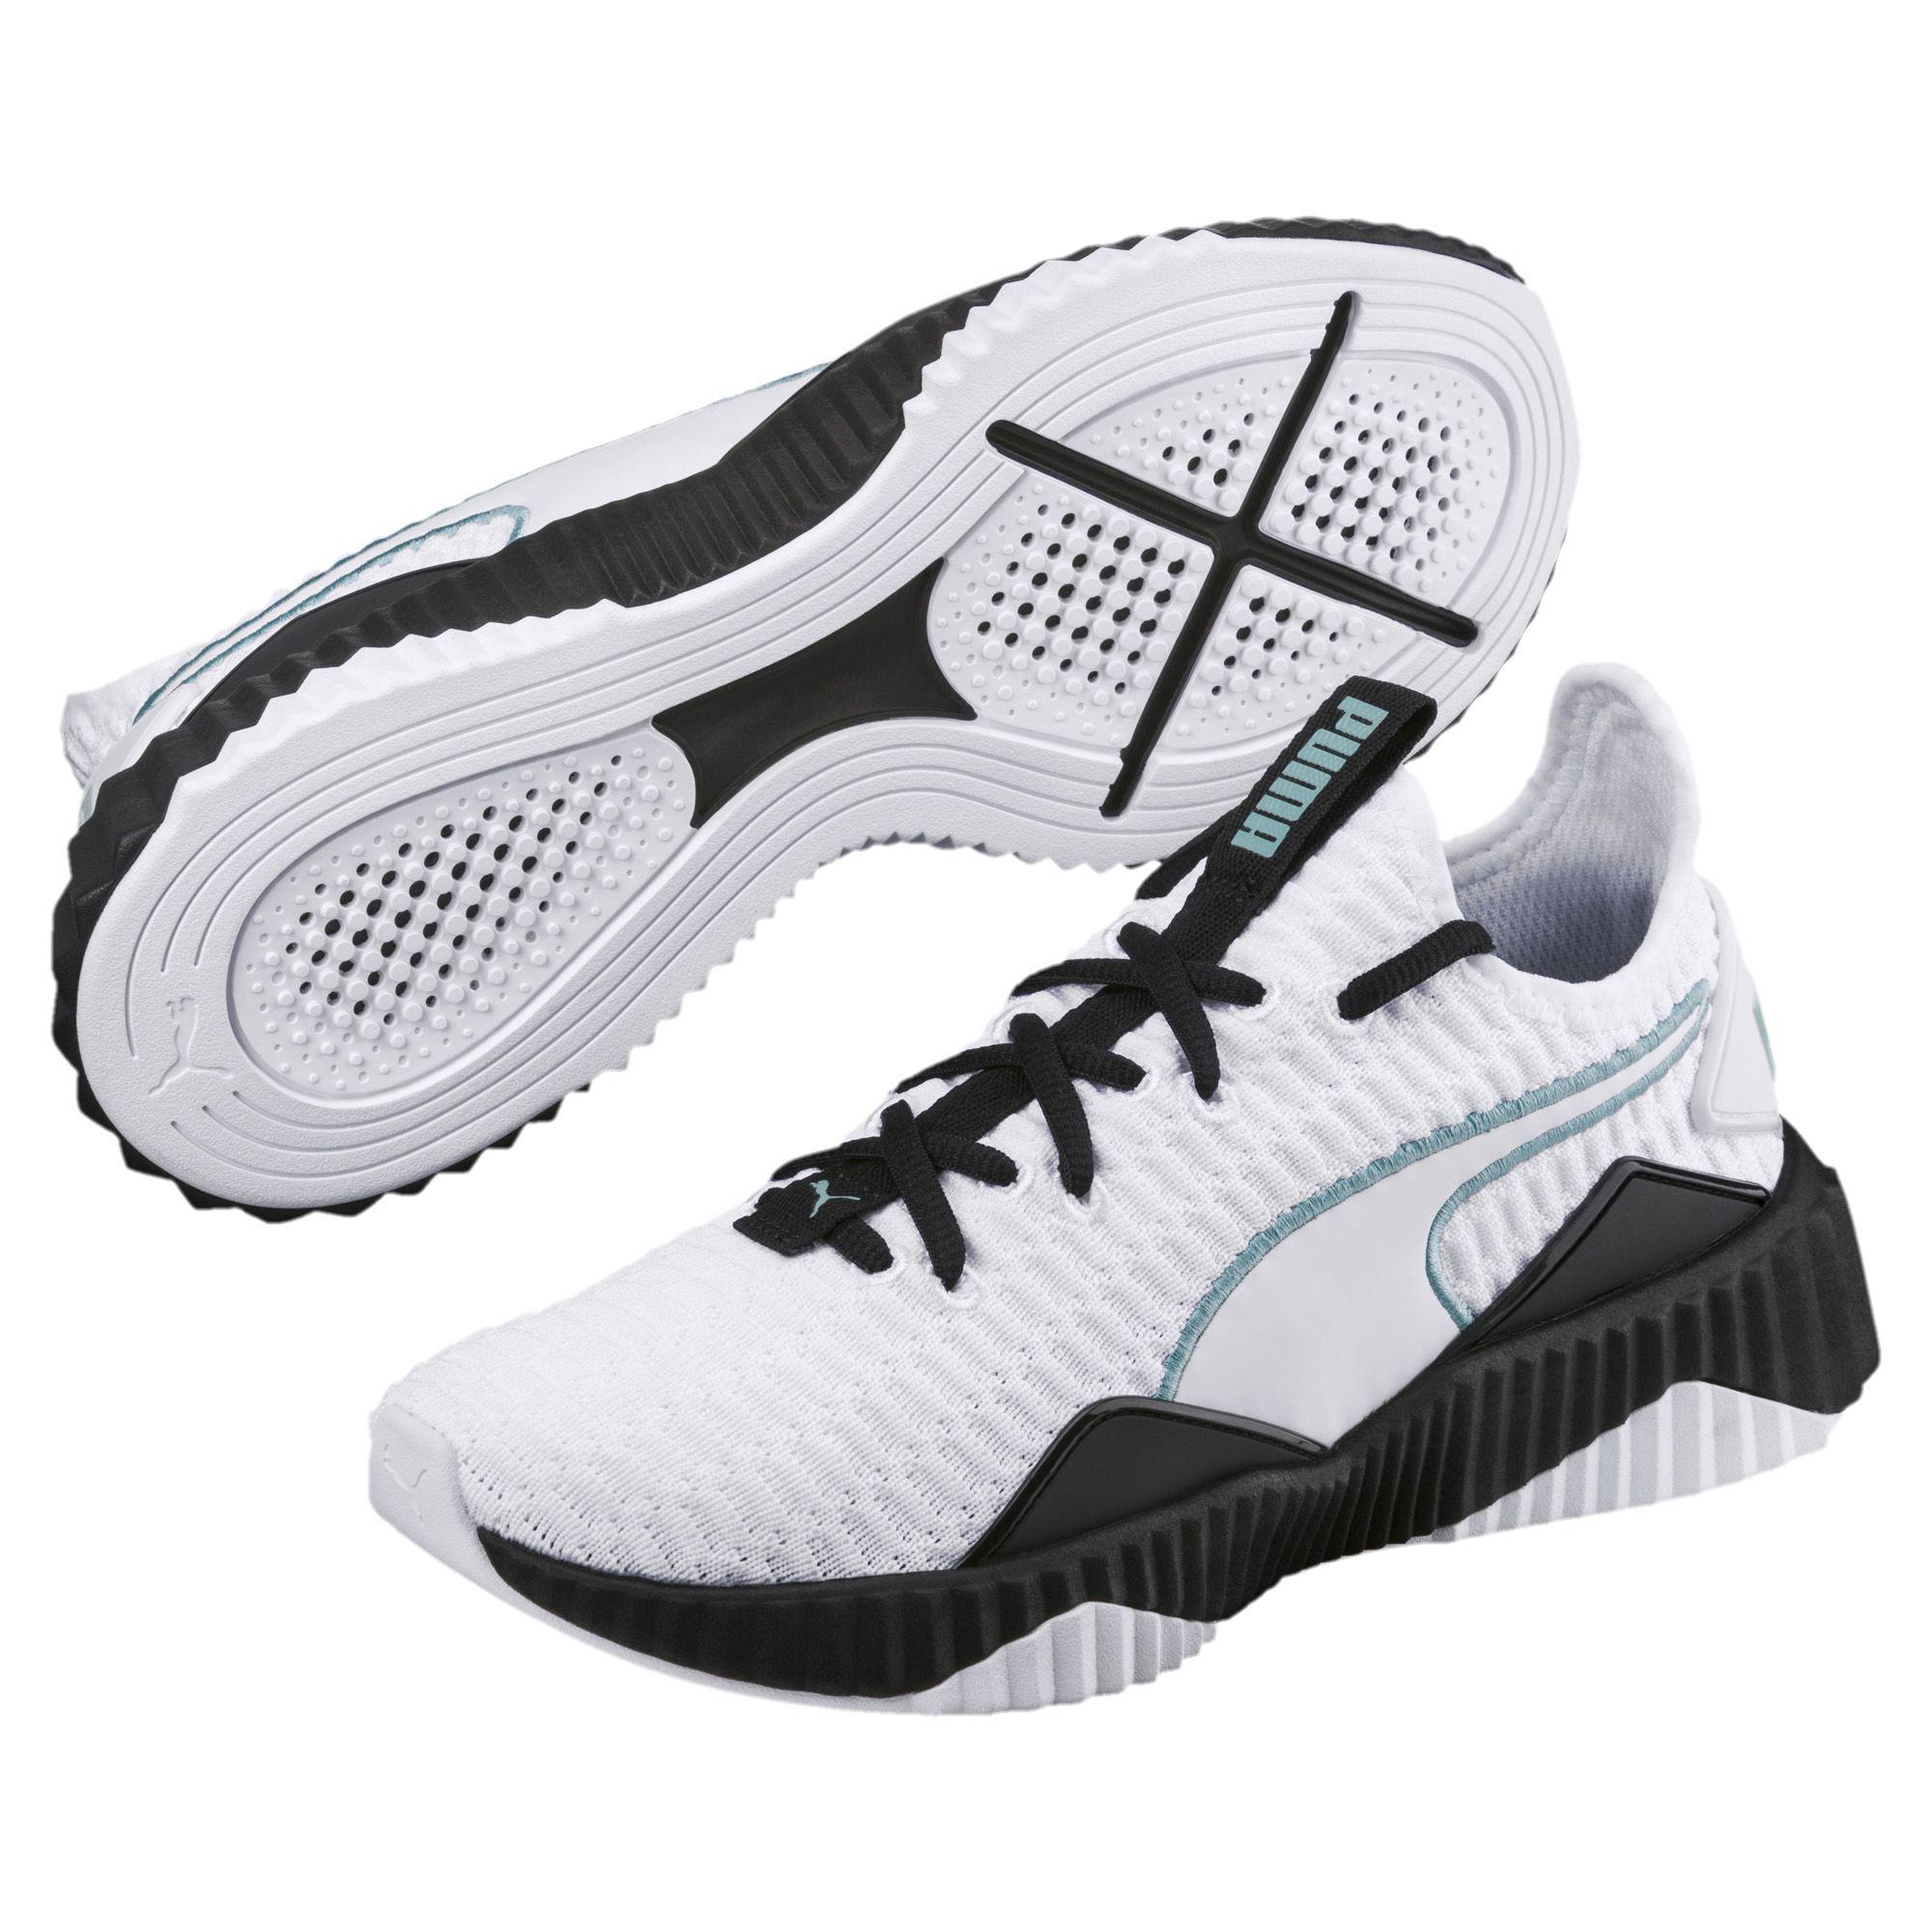 aa1bf0ee375e41 PUMA - White Defy Women s Sneakers - Lyst. View fullscreen